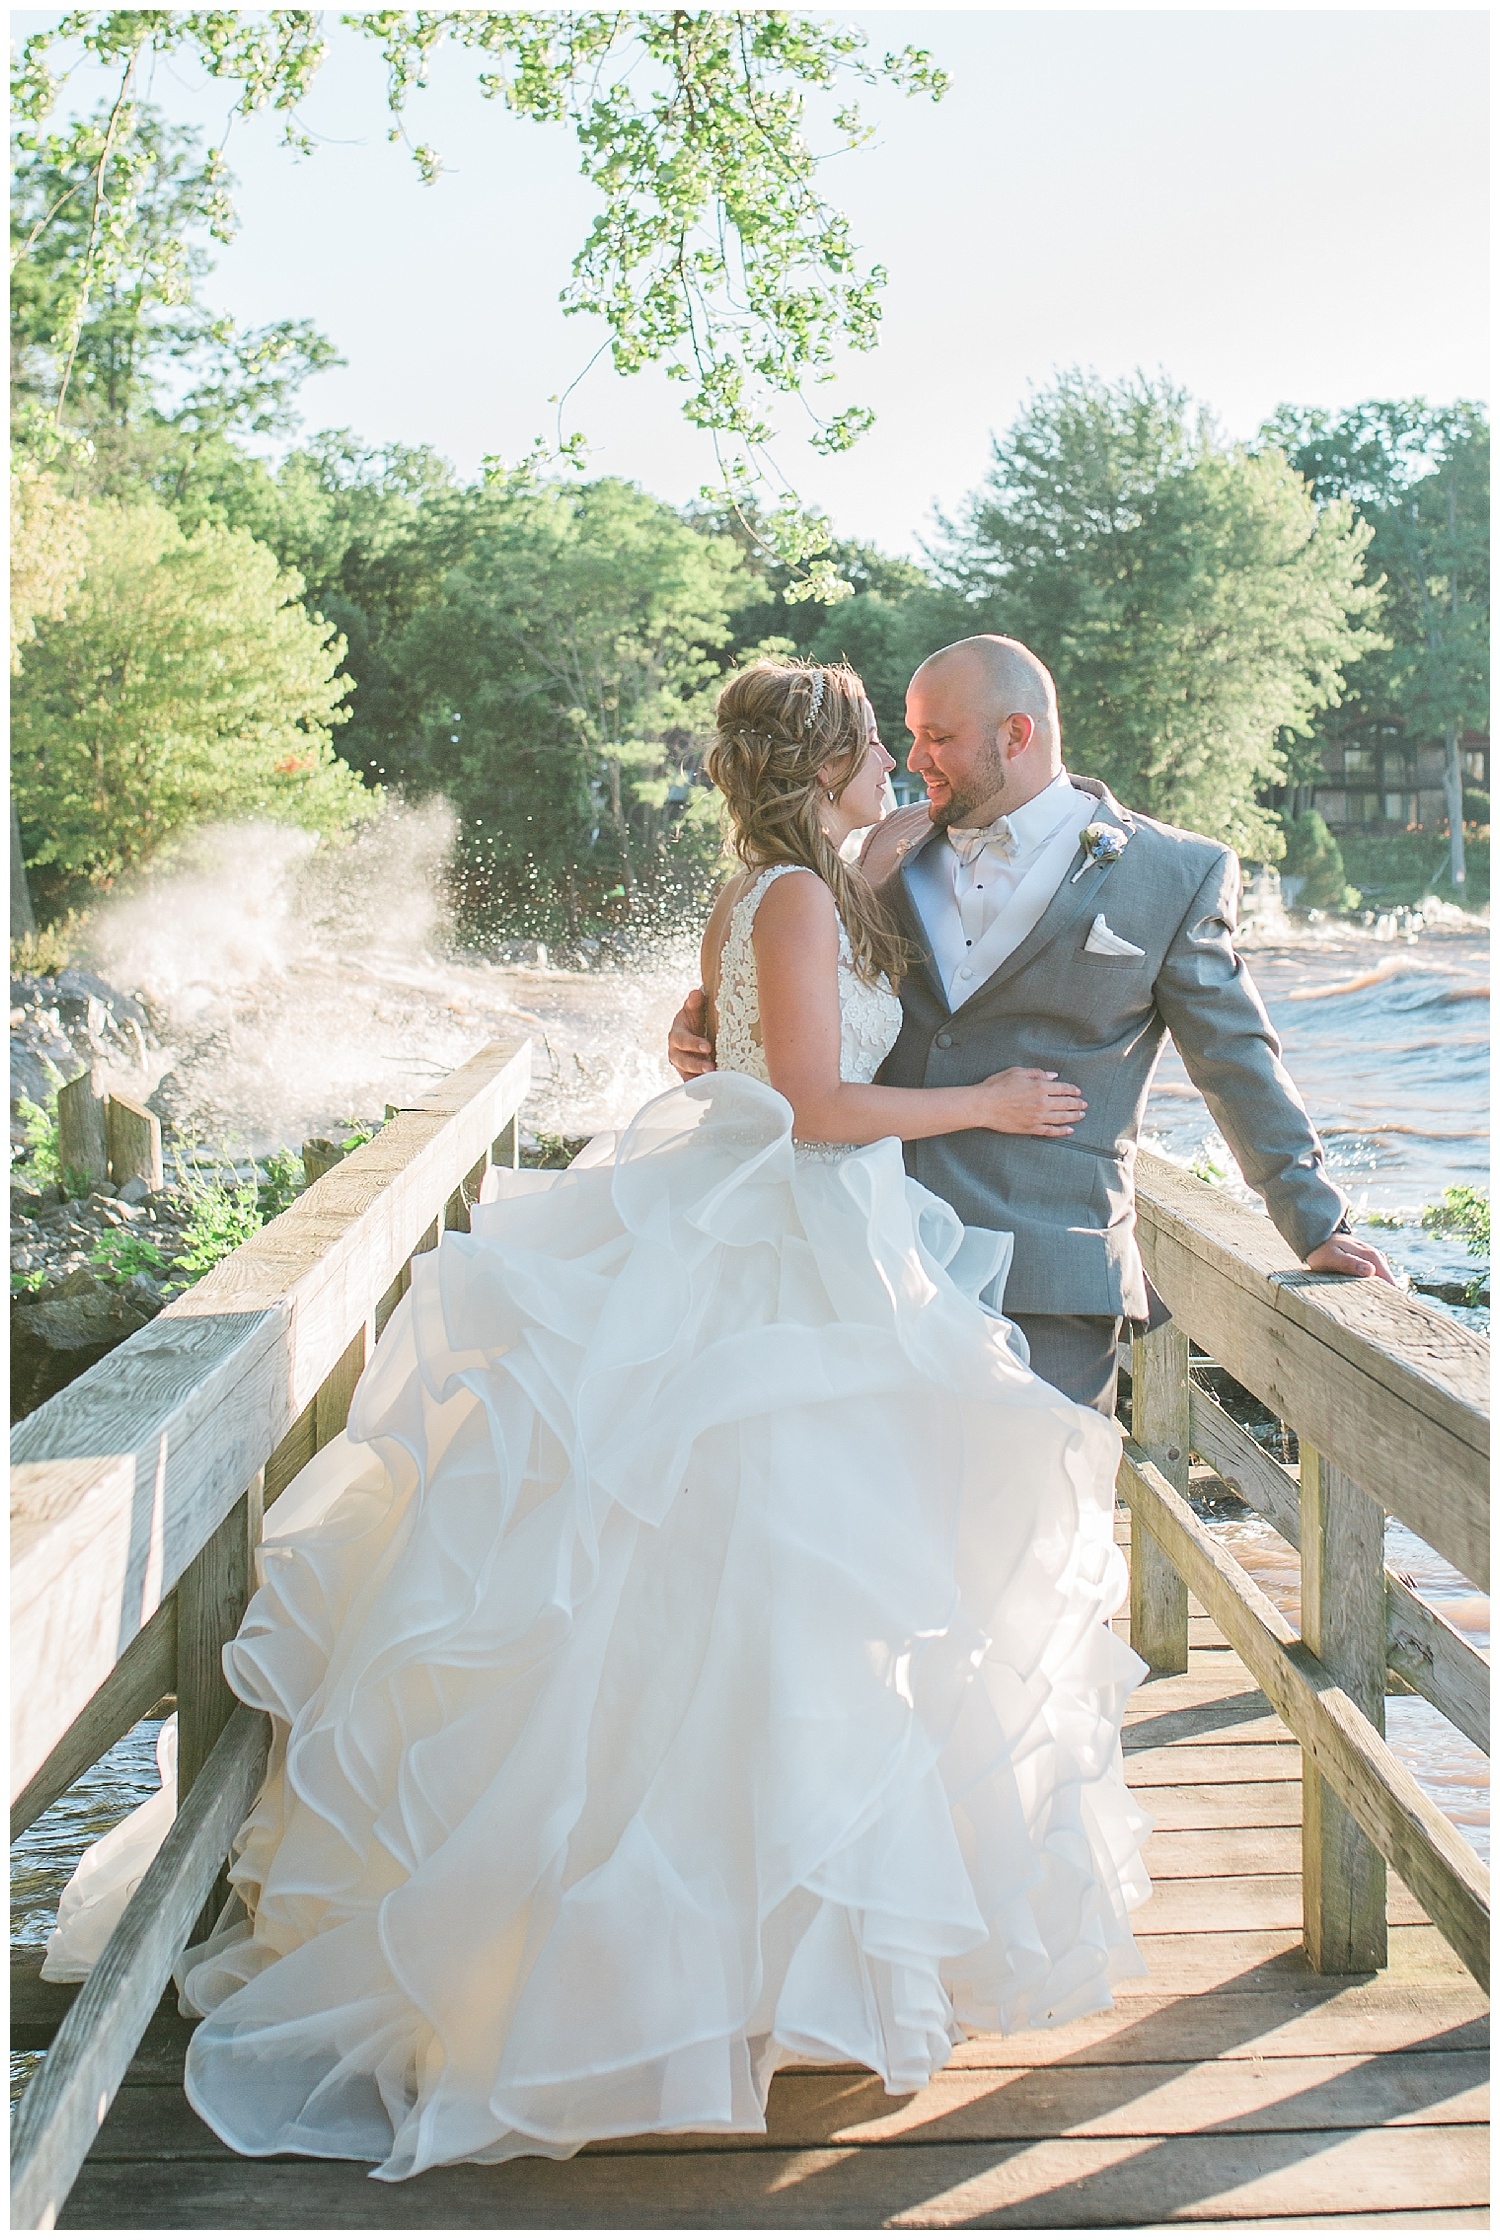 Sean and Andrea - Webster wedding - lass and beau-1101_Buffalo wedding photography.jpg